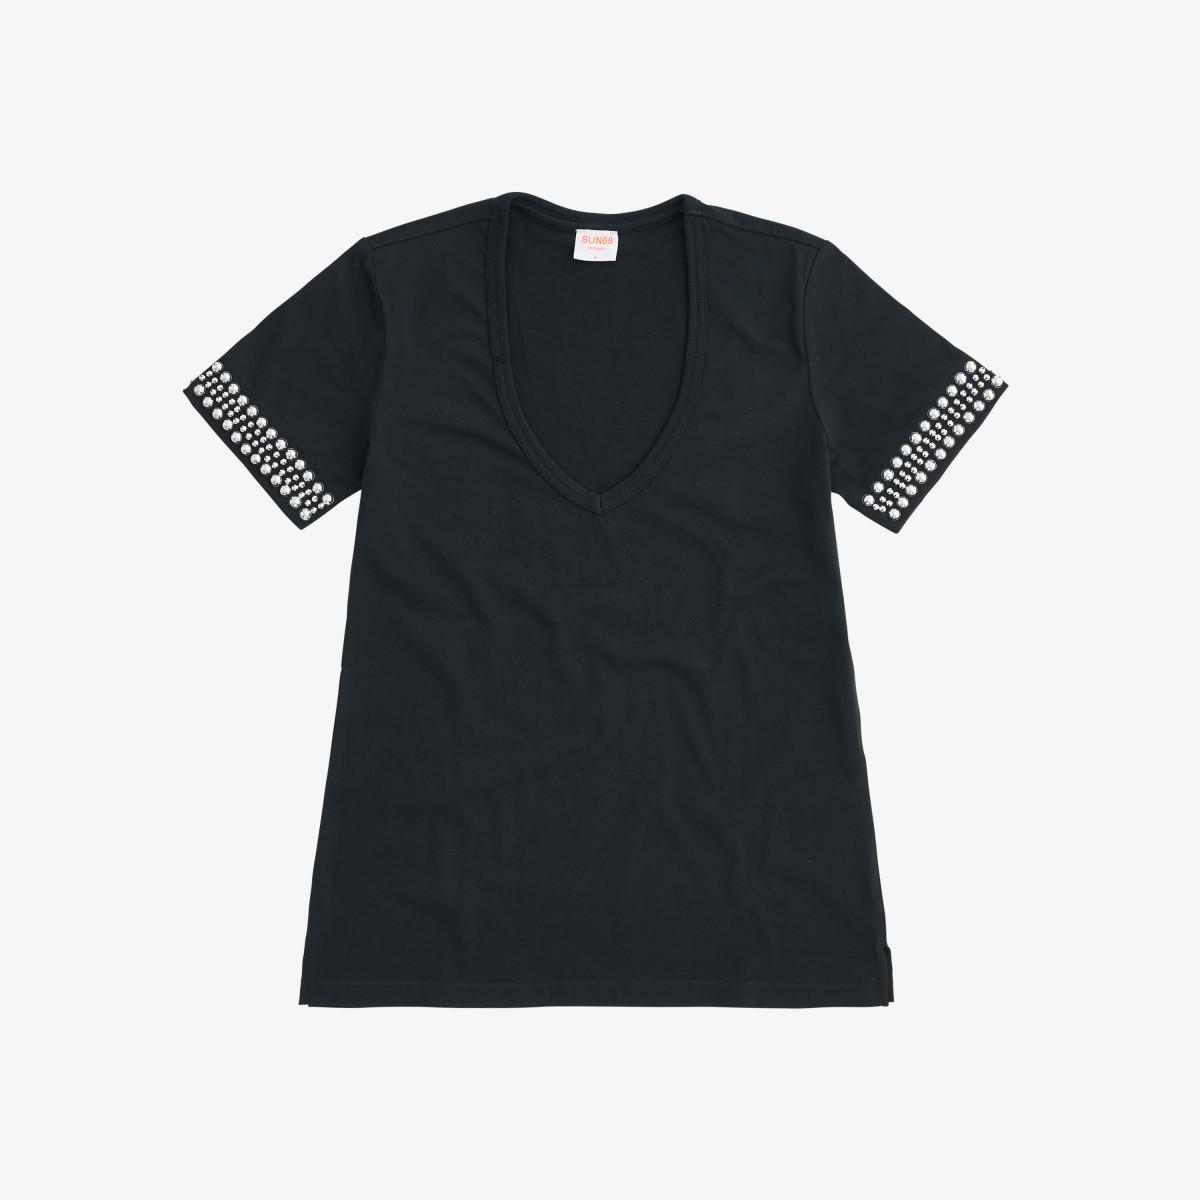 T-SHIRT V NECK STUDS S/S BLACK